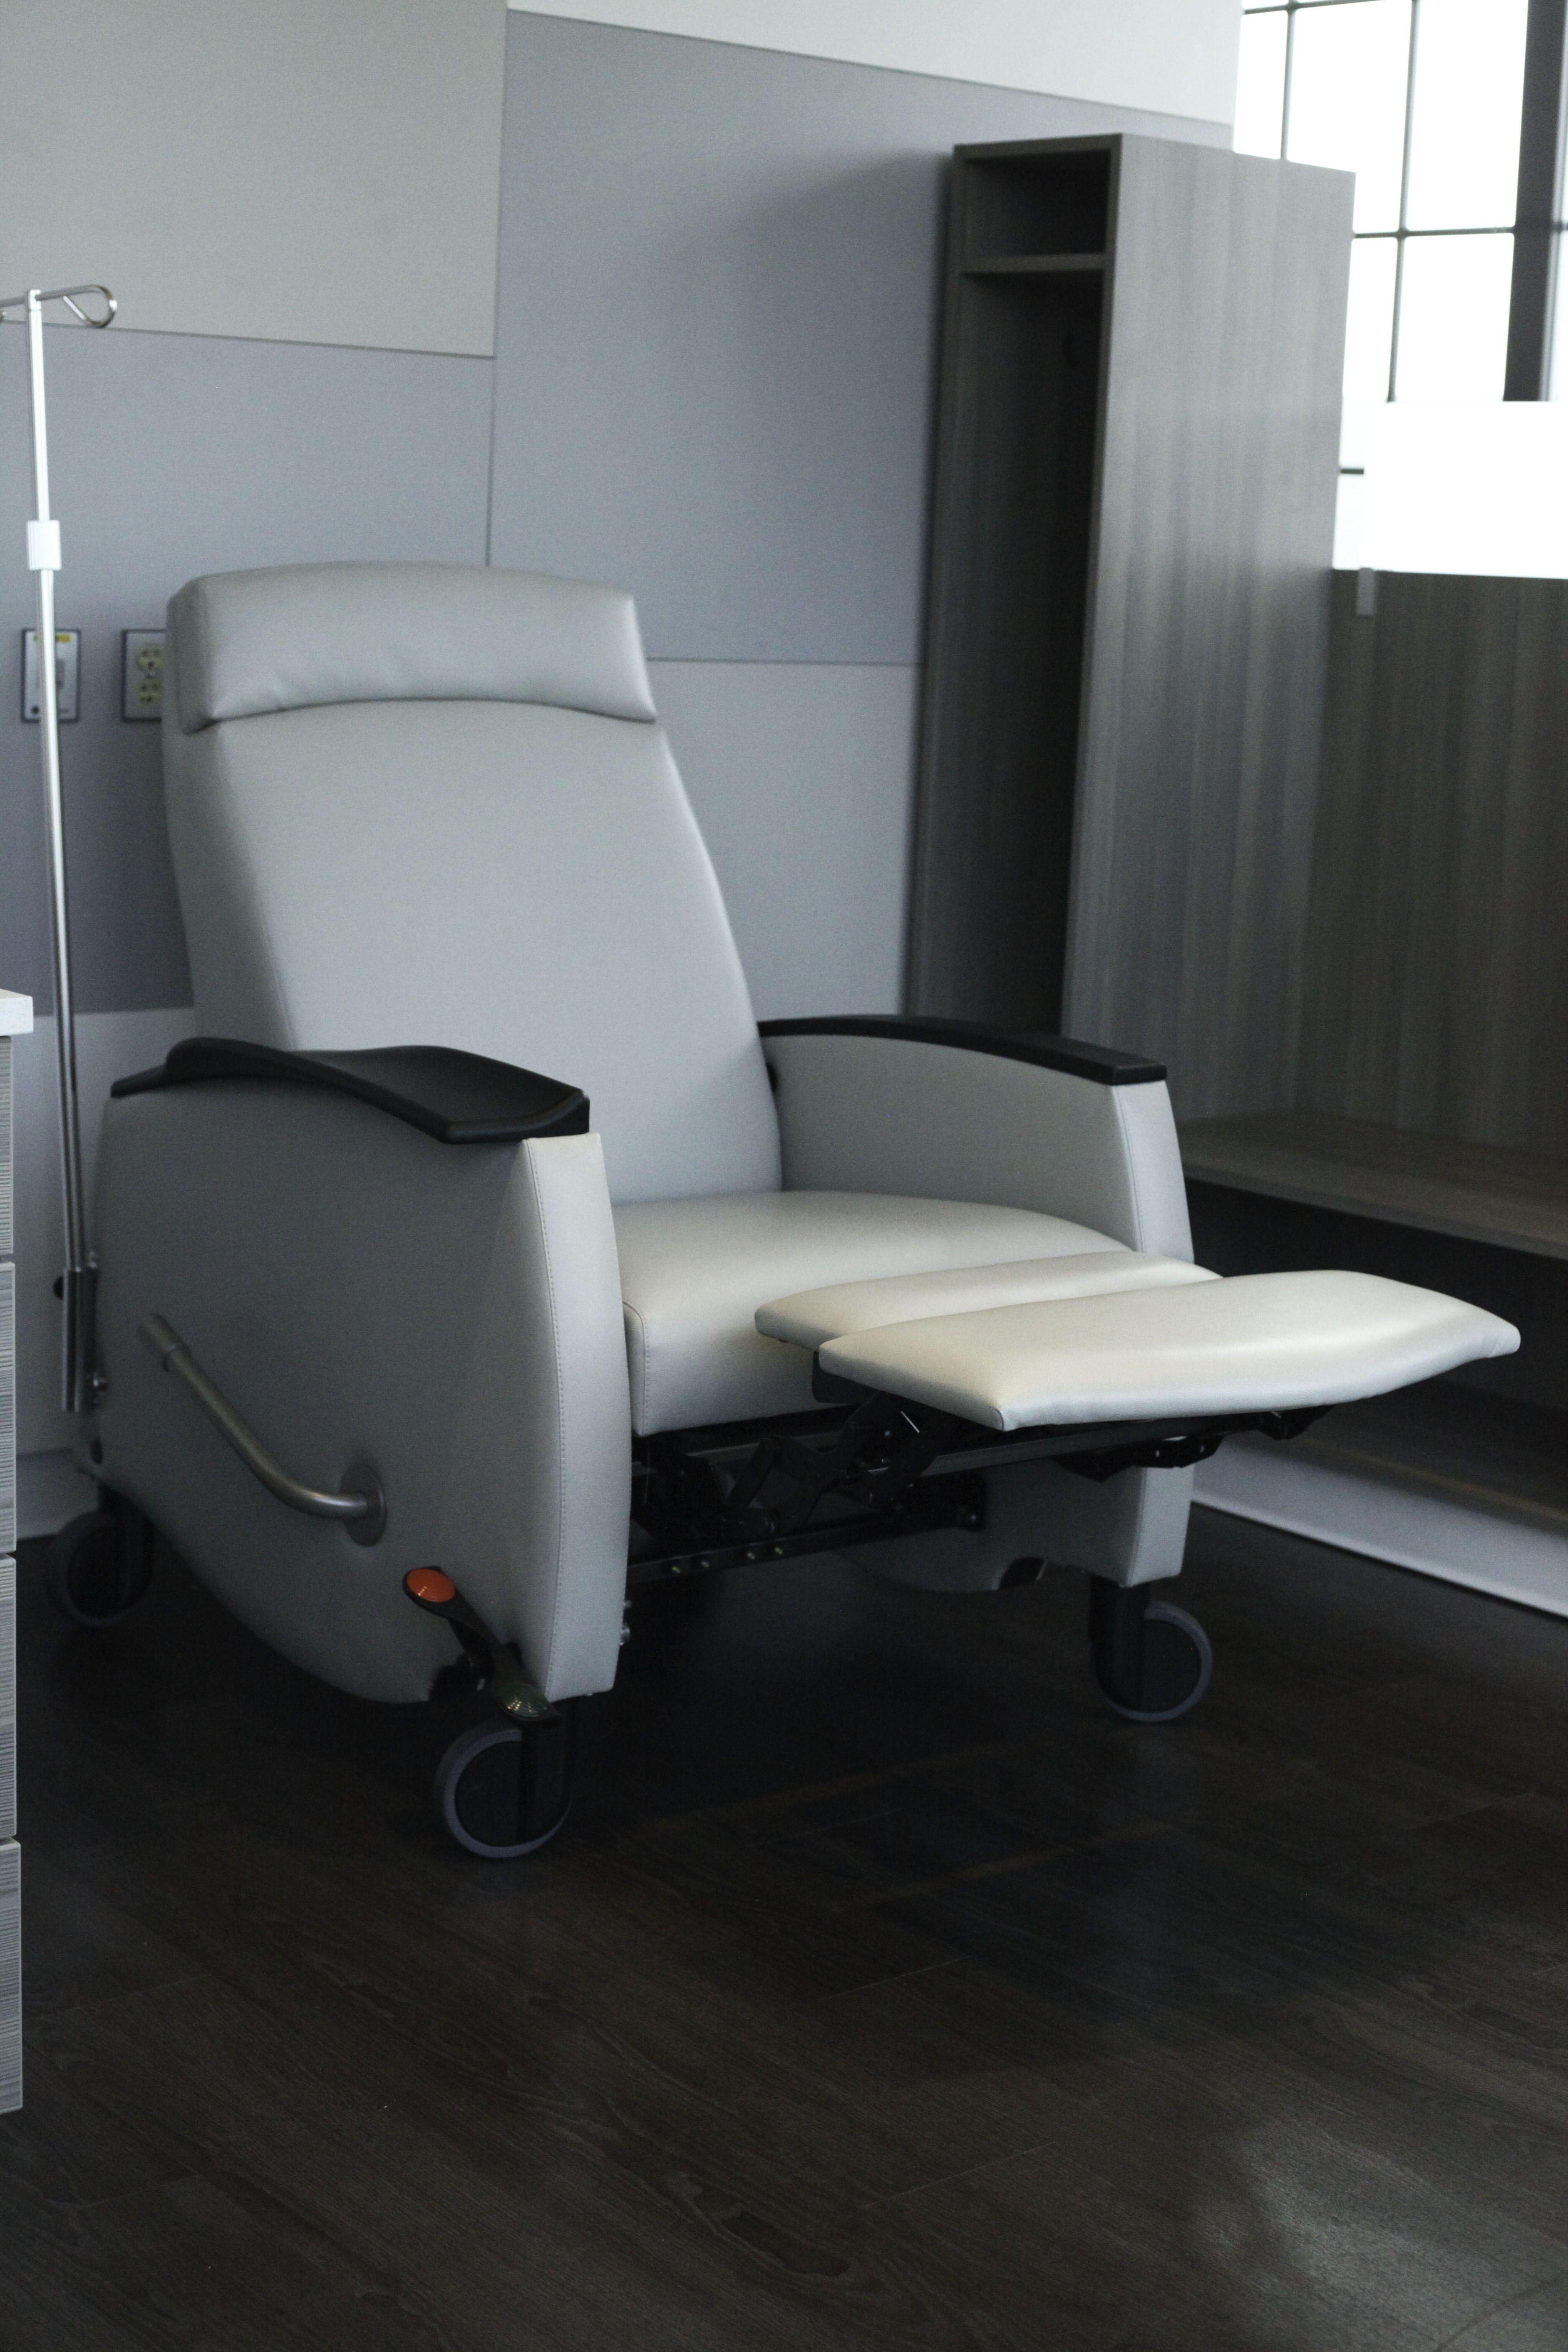 Orchestra Treatment Recliner | Manufacturer: Carolina Business Furniture |  Manufacturer Website: Http:/